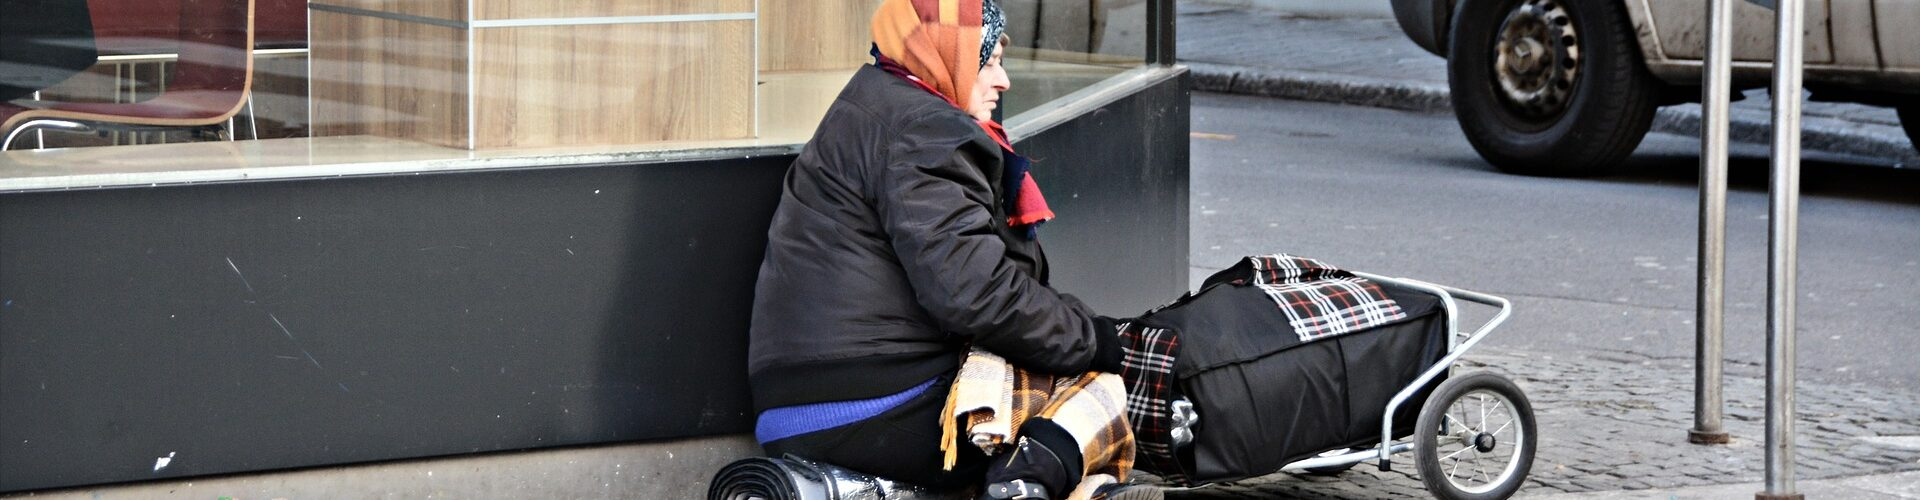 Tiggerforbud i Norge